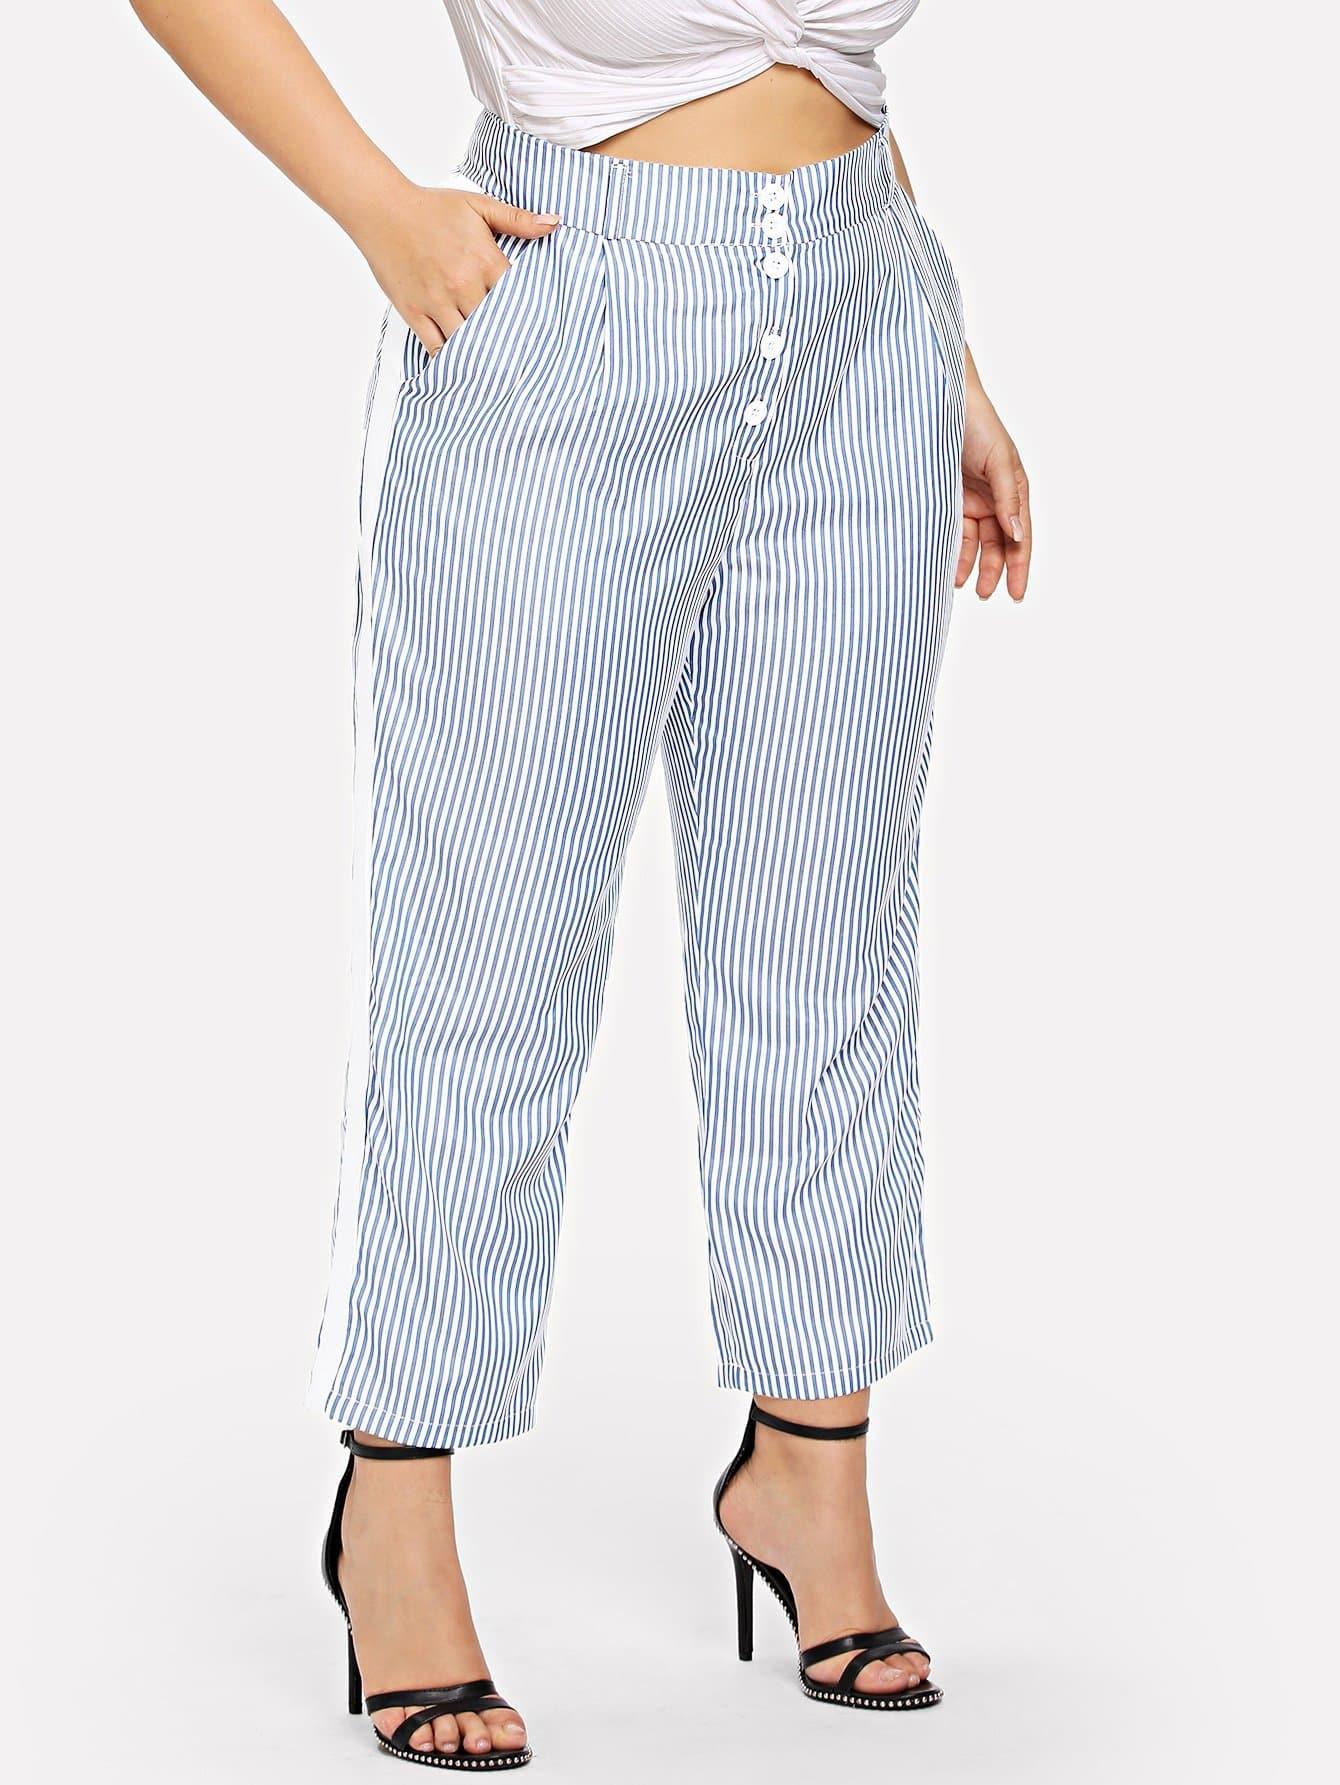 Contrast Panel Side Striped Pants contrast panel side pleated harem pants